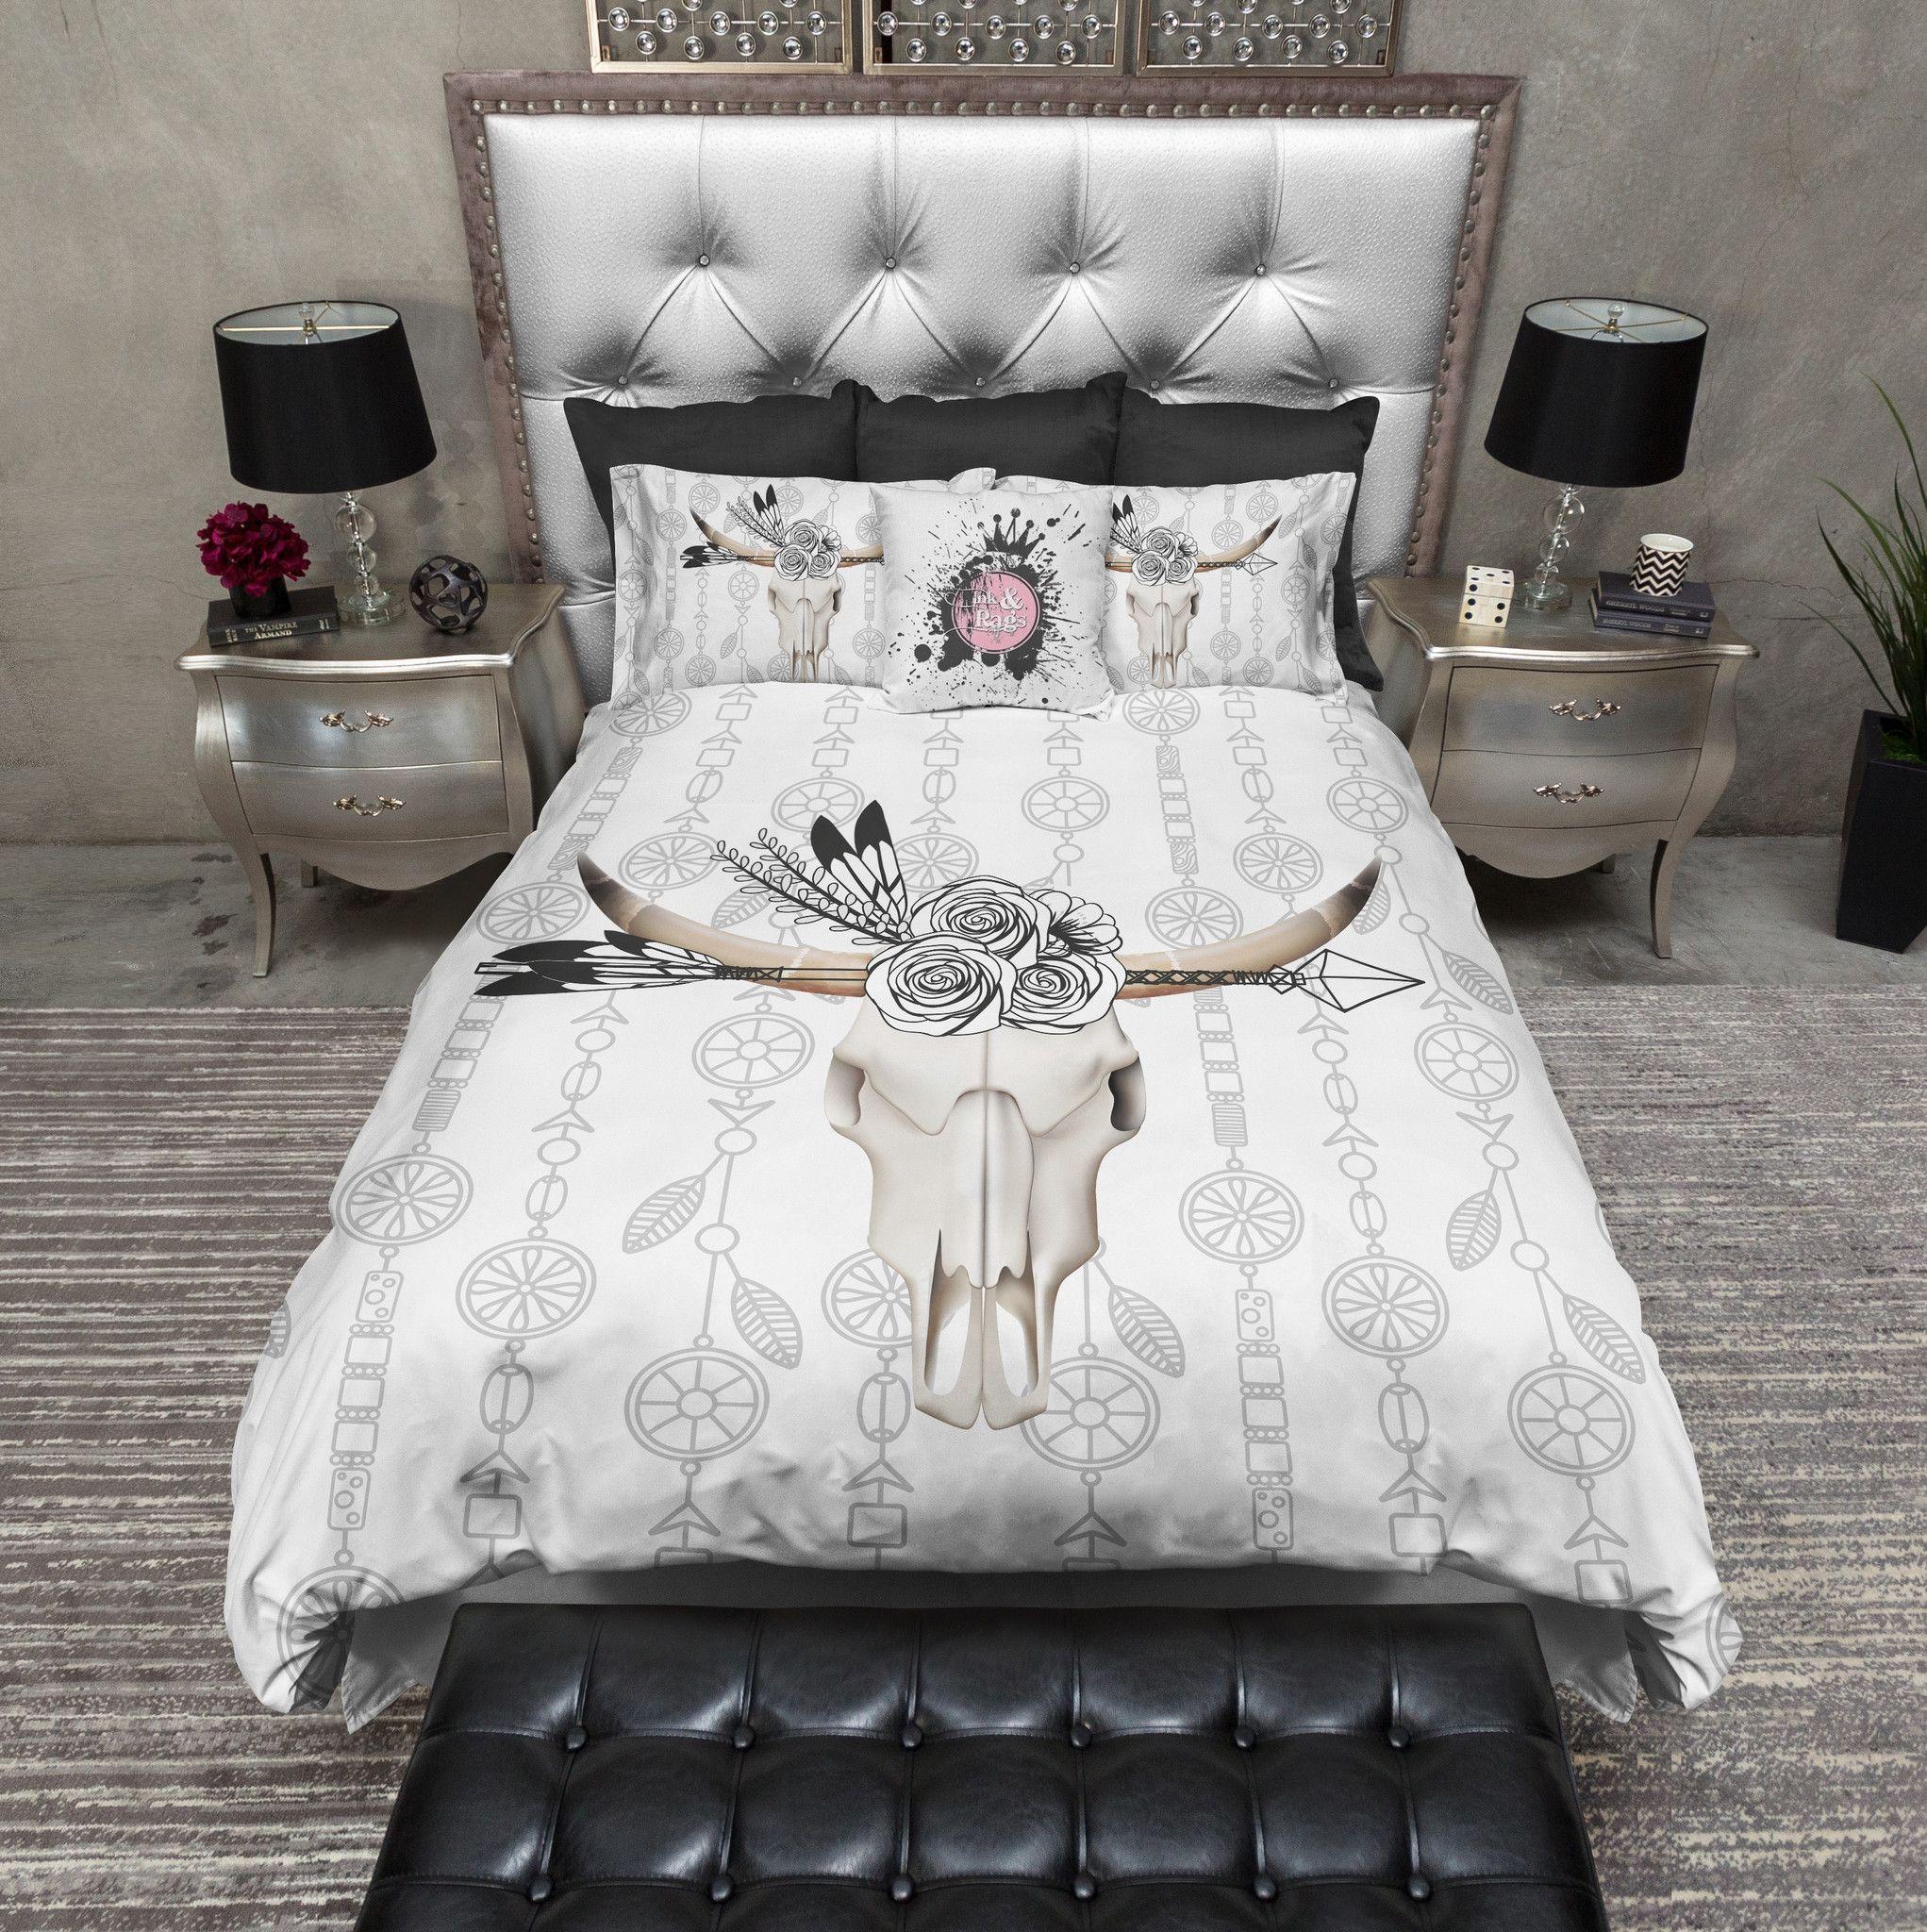 catalog queen pillowcase ikea comforter and cover products full duvet double us s en nattjasmin